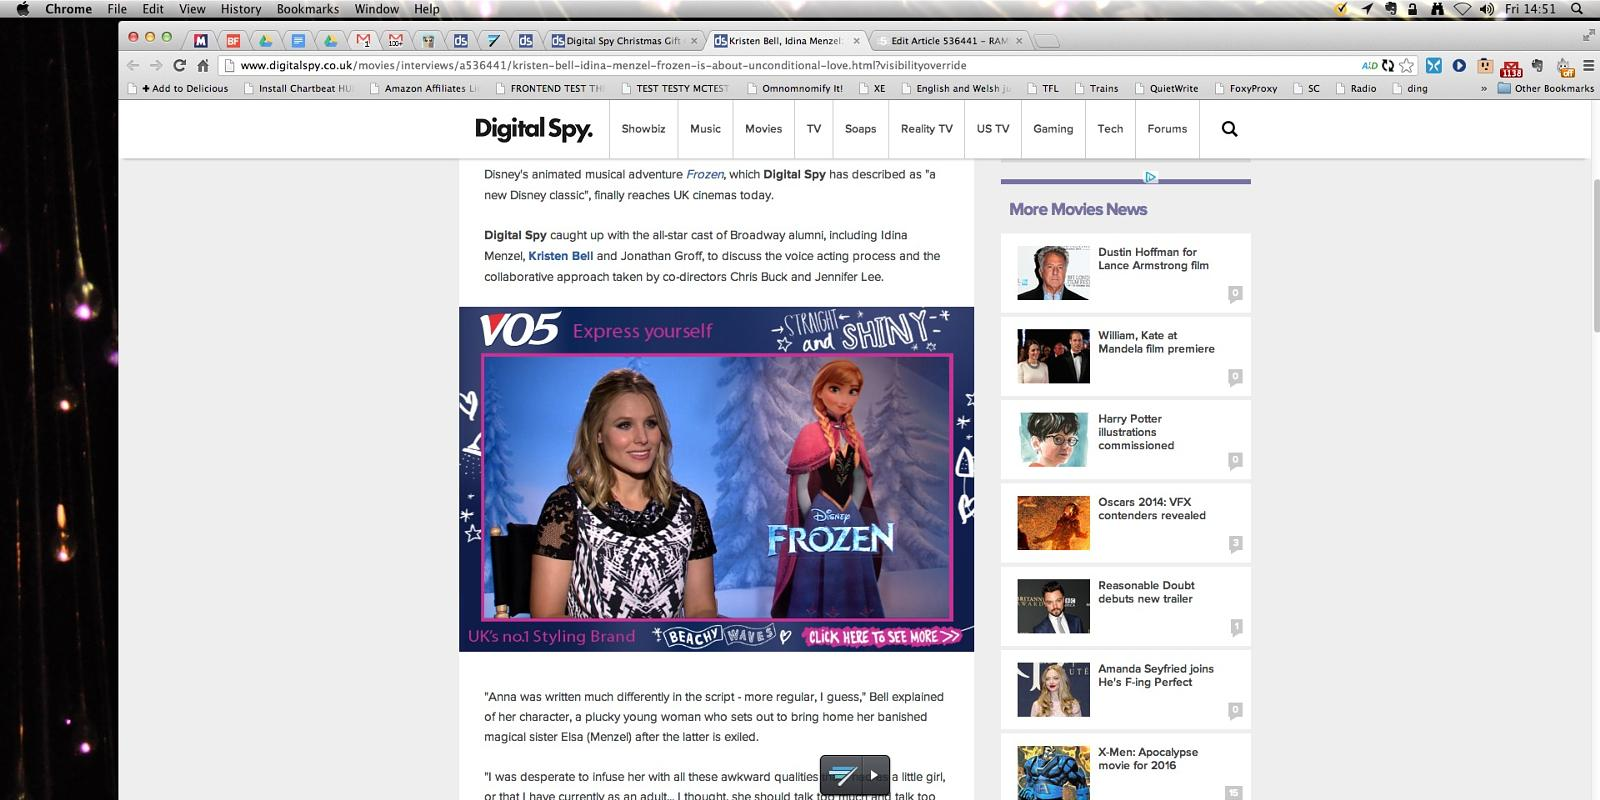 Kristen Bell, Idina Menzel: \'Frozen is about unconditional love\'